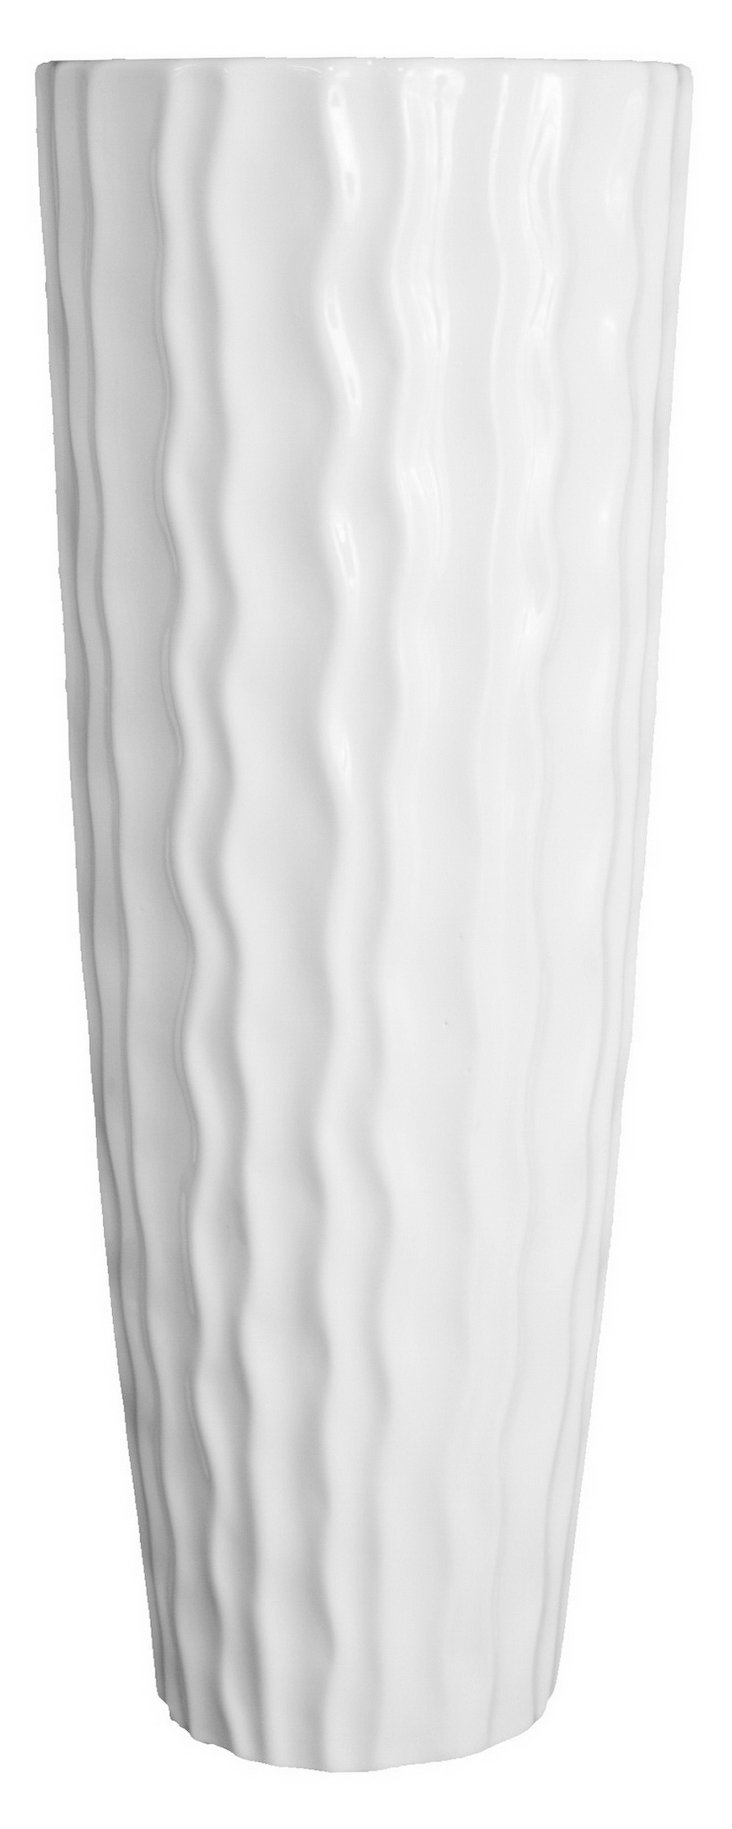 "18"" Grooved Vase"